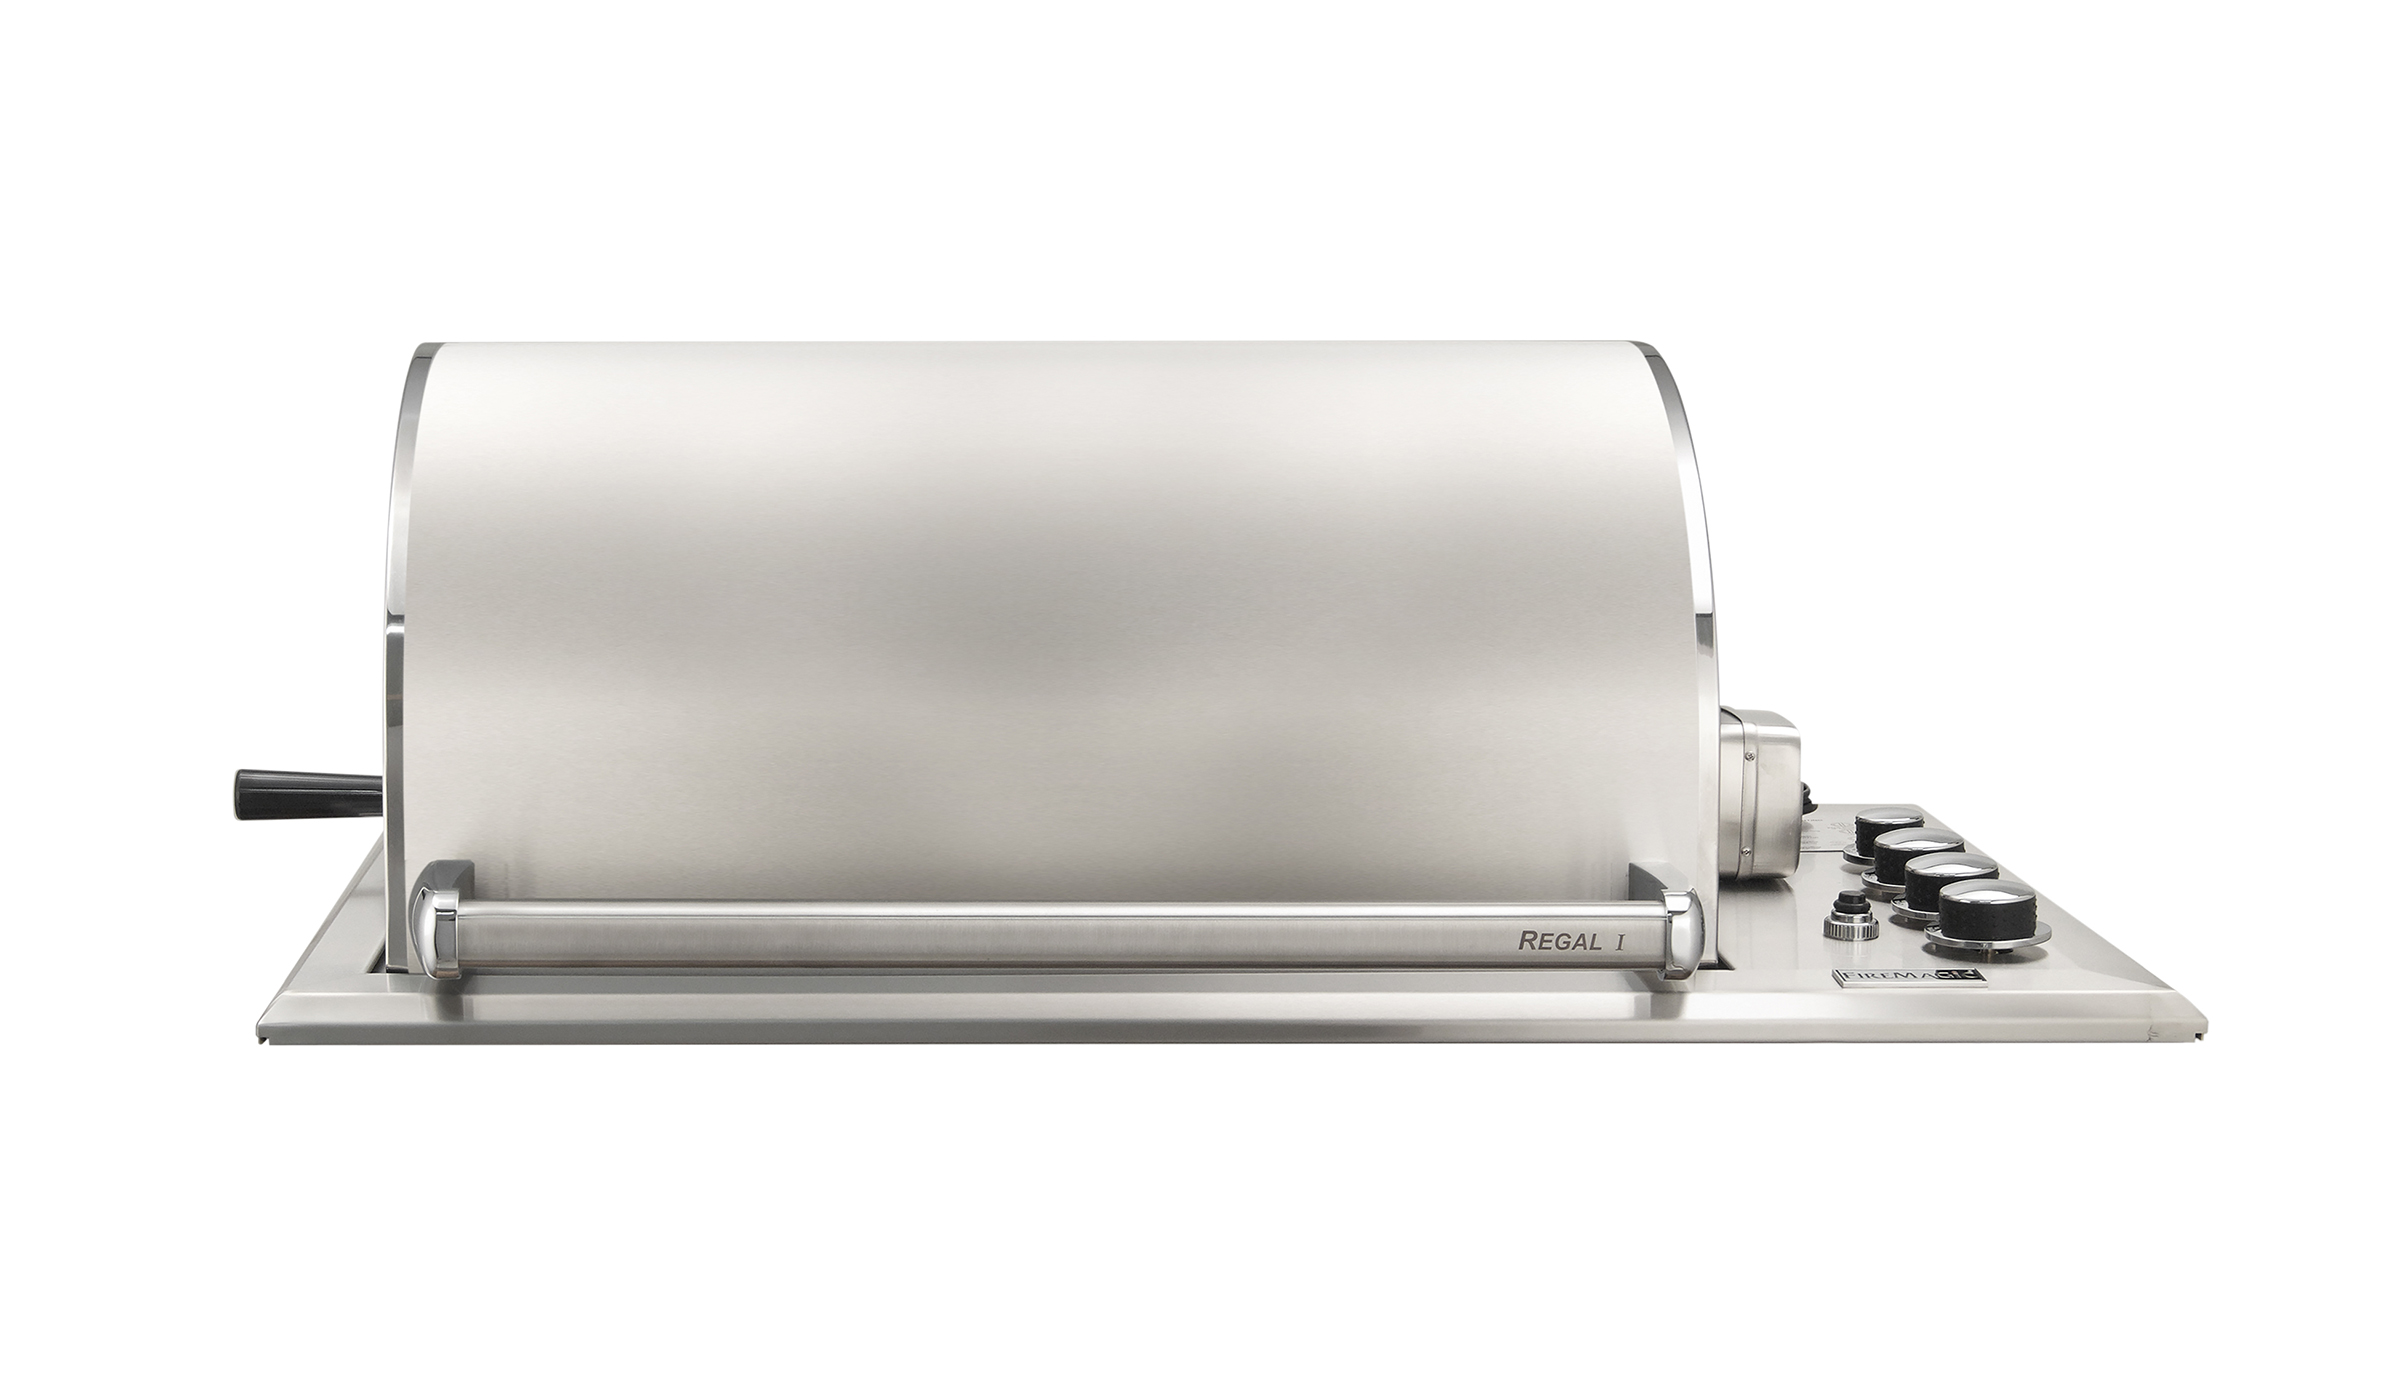 fm-34-s2s1n-a-regal-i-drop-in-grill-closed.jpg